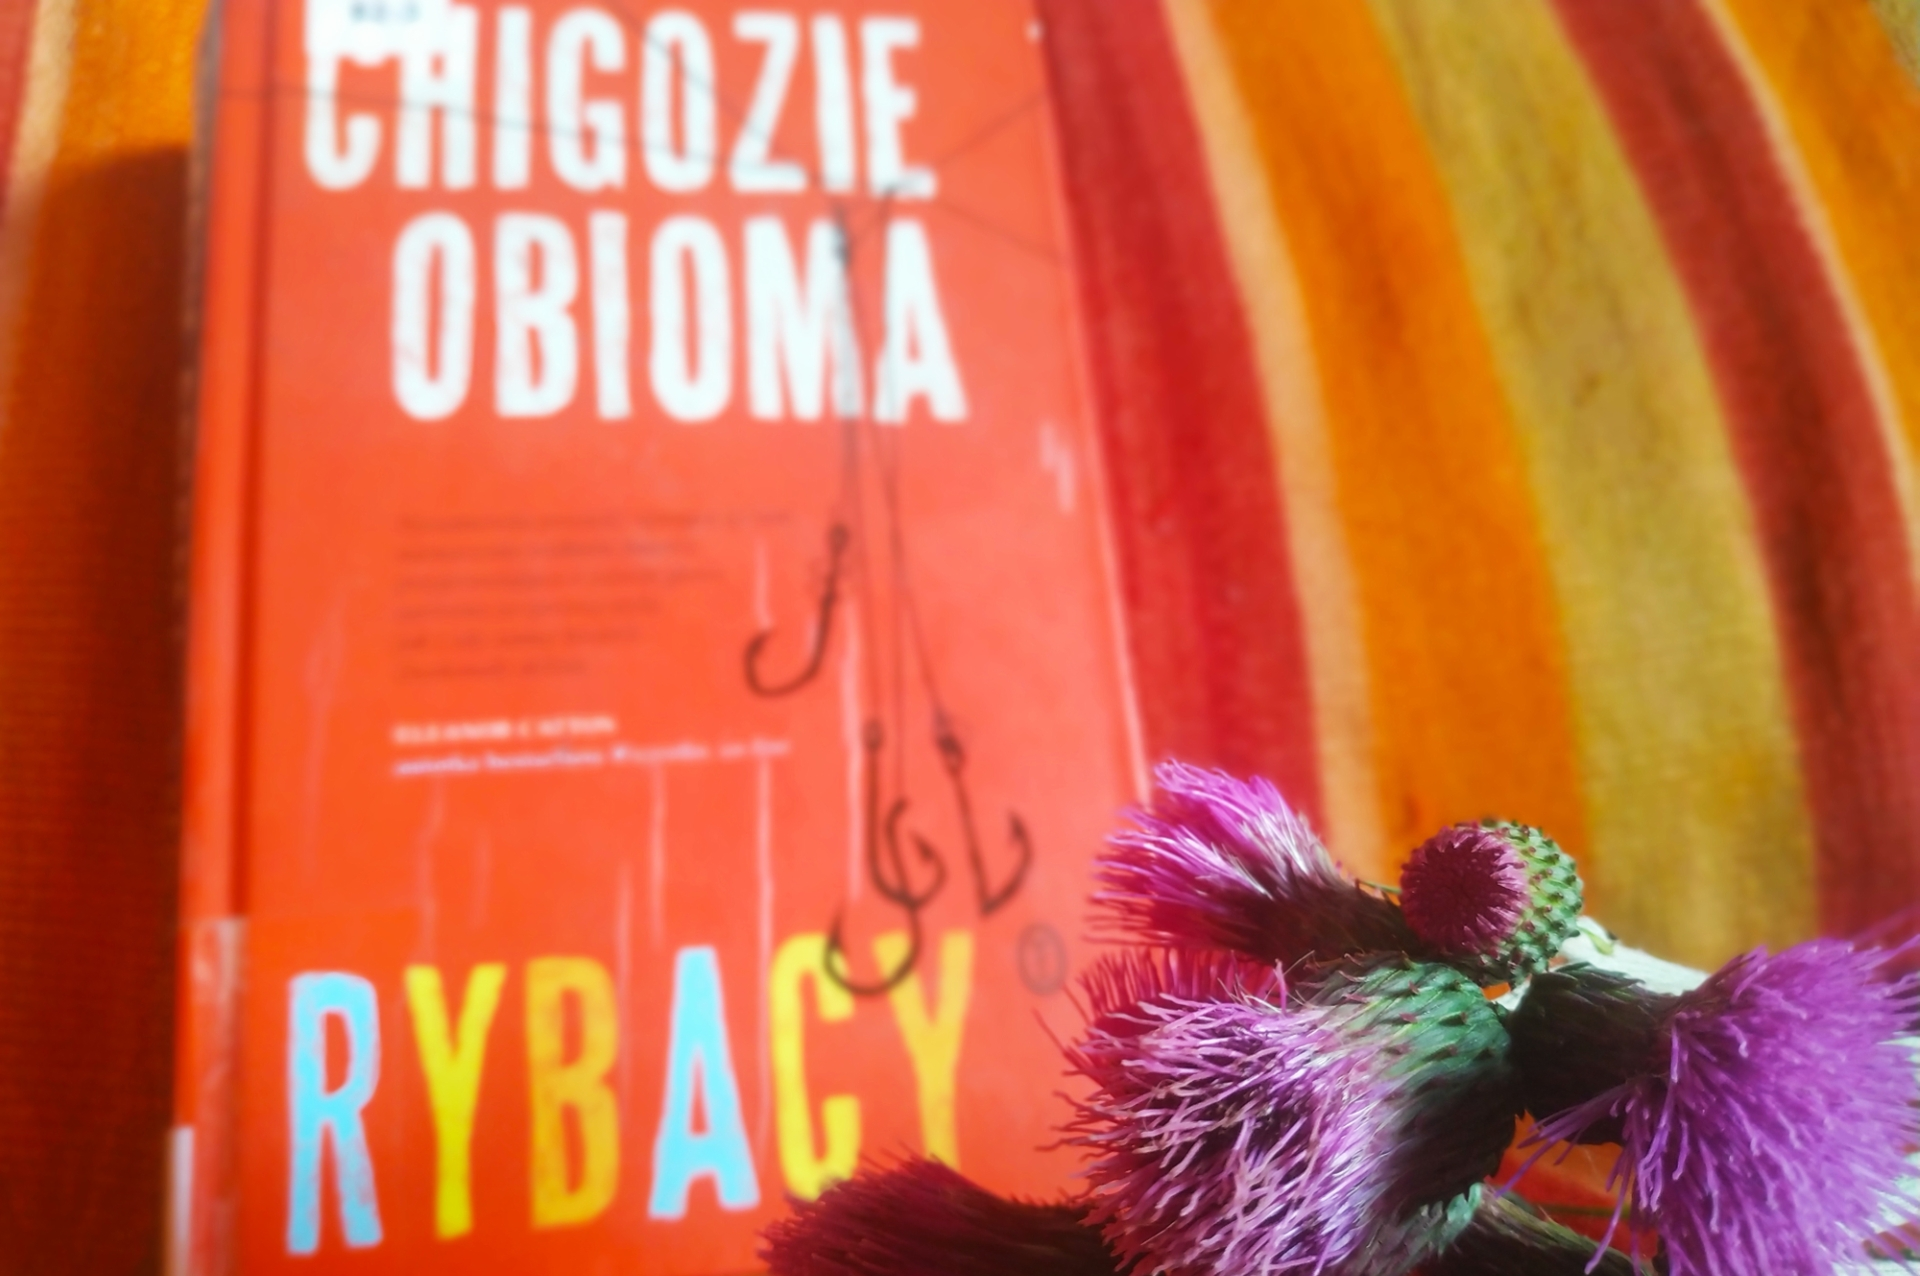 chigozie-obioma-rybacy